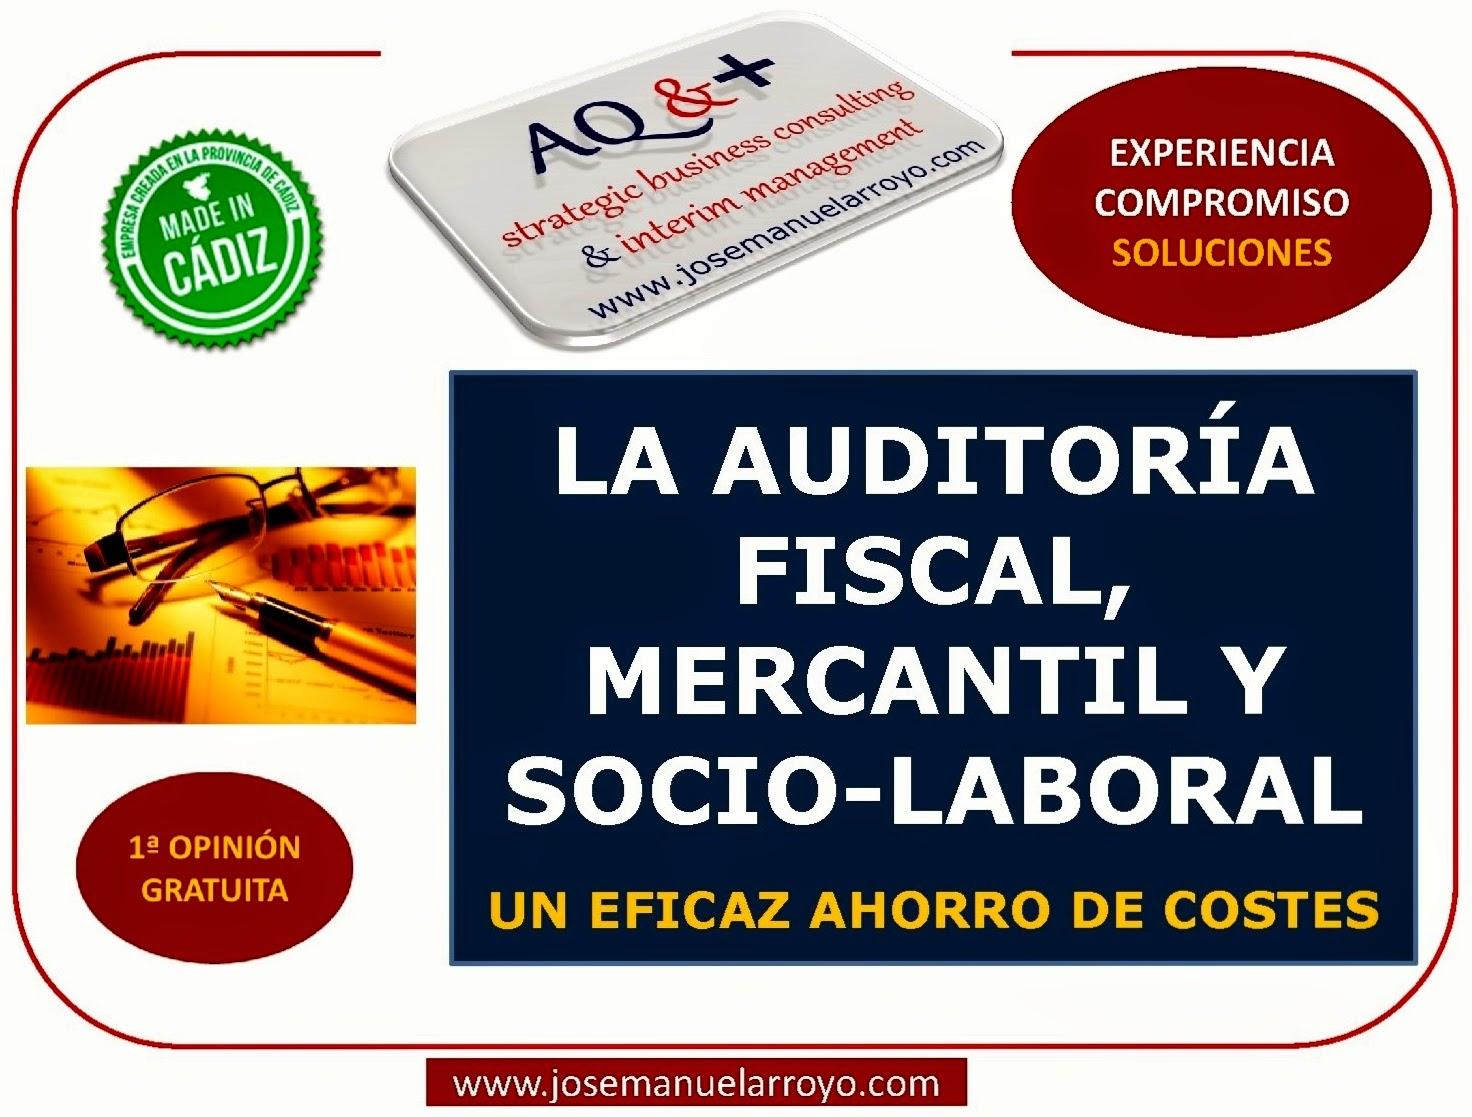 Auditoria Fiscal, Mercantil y Socio-Laboral